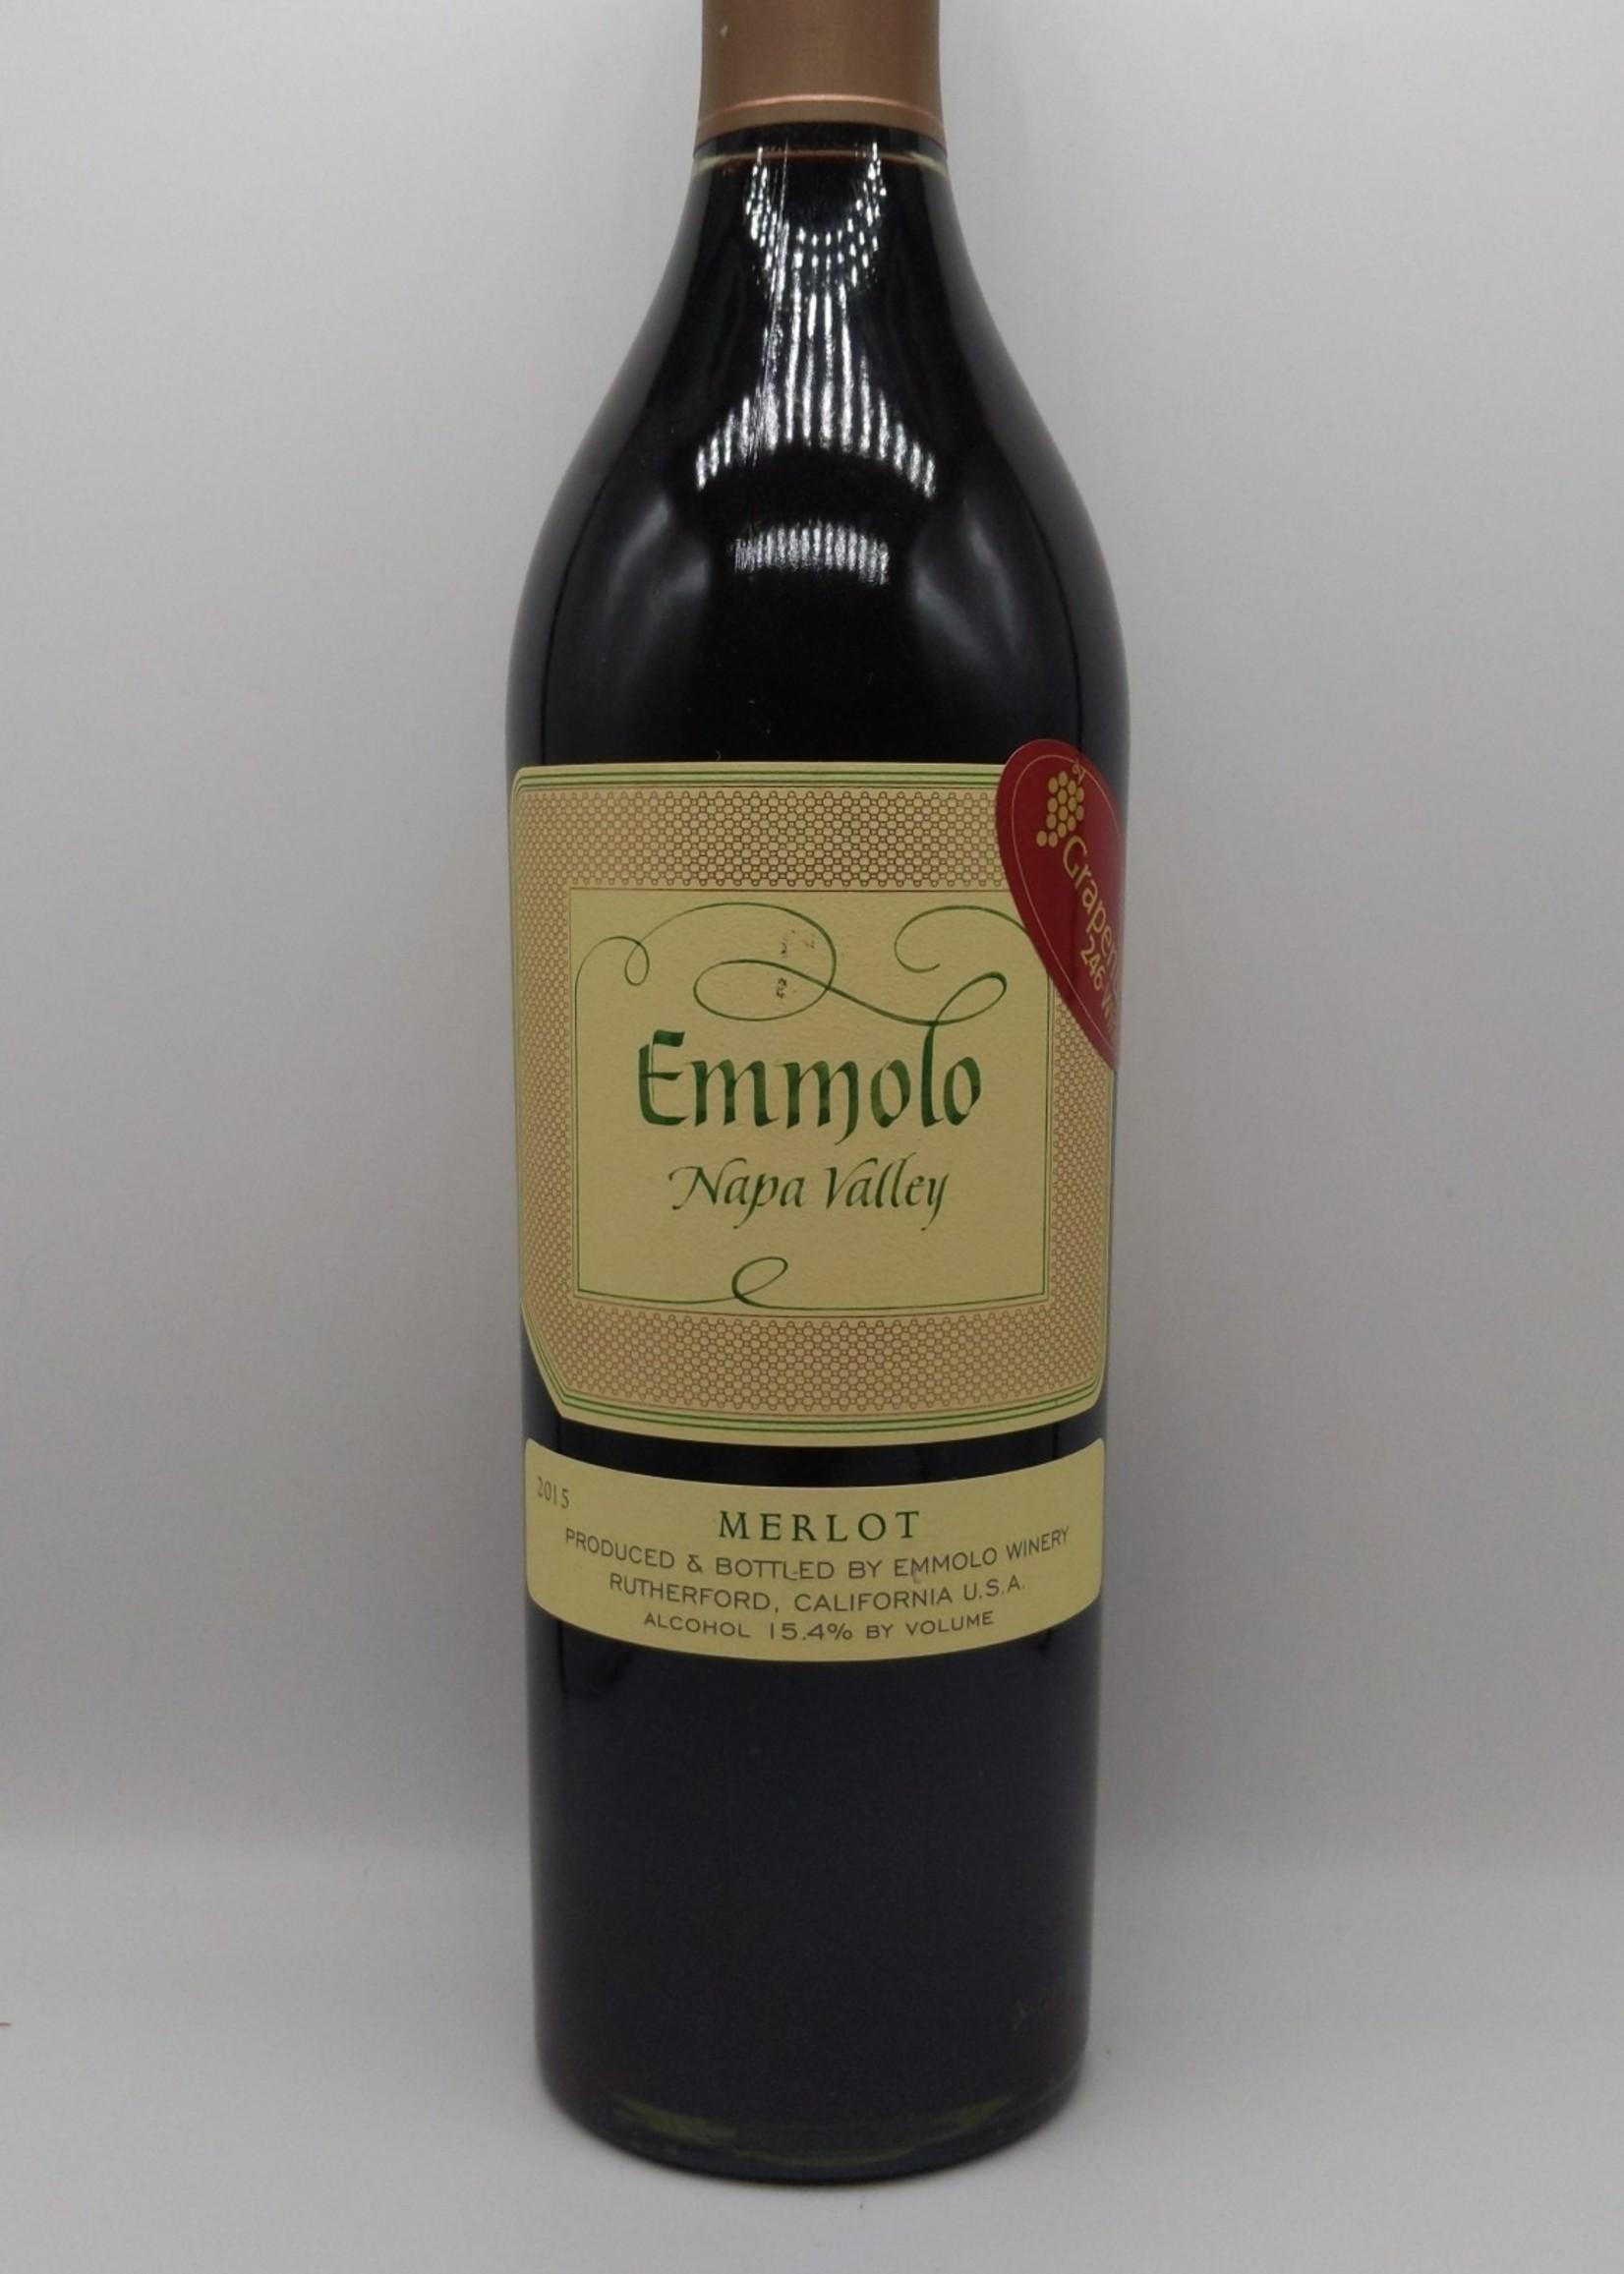 2015 EMMOLO MERLOT 750ml